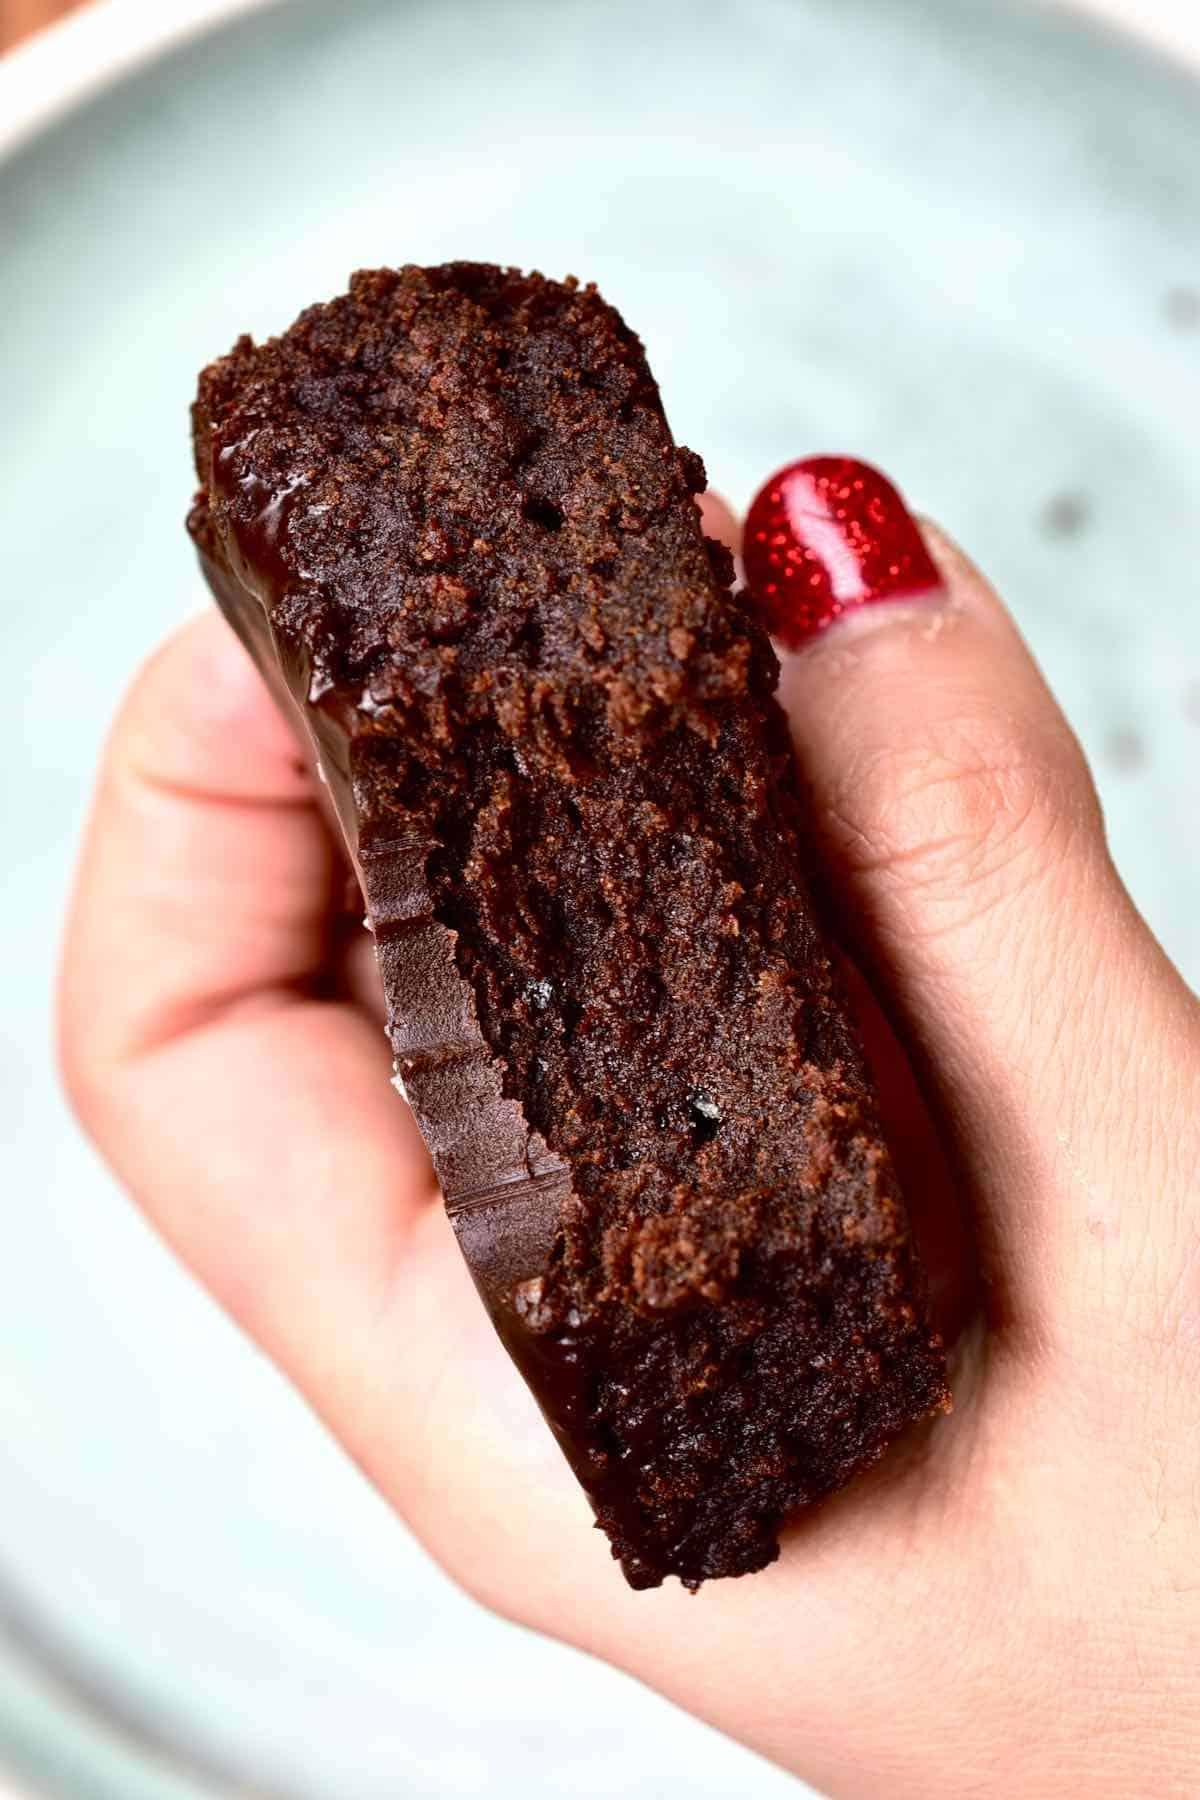 A hand holding a half eaten brownie piece